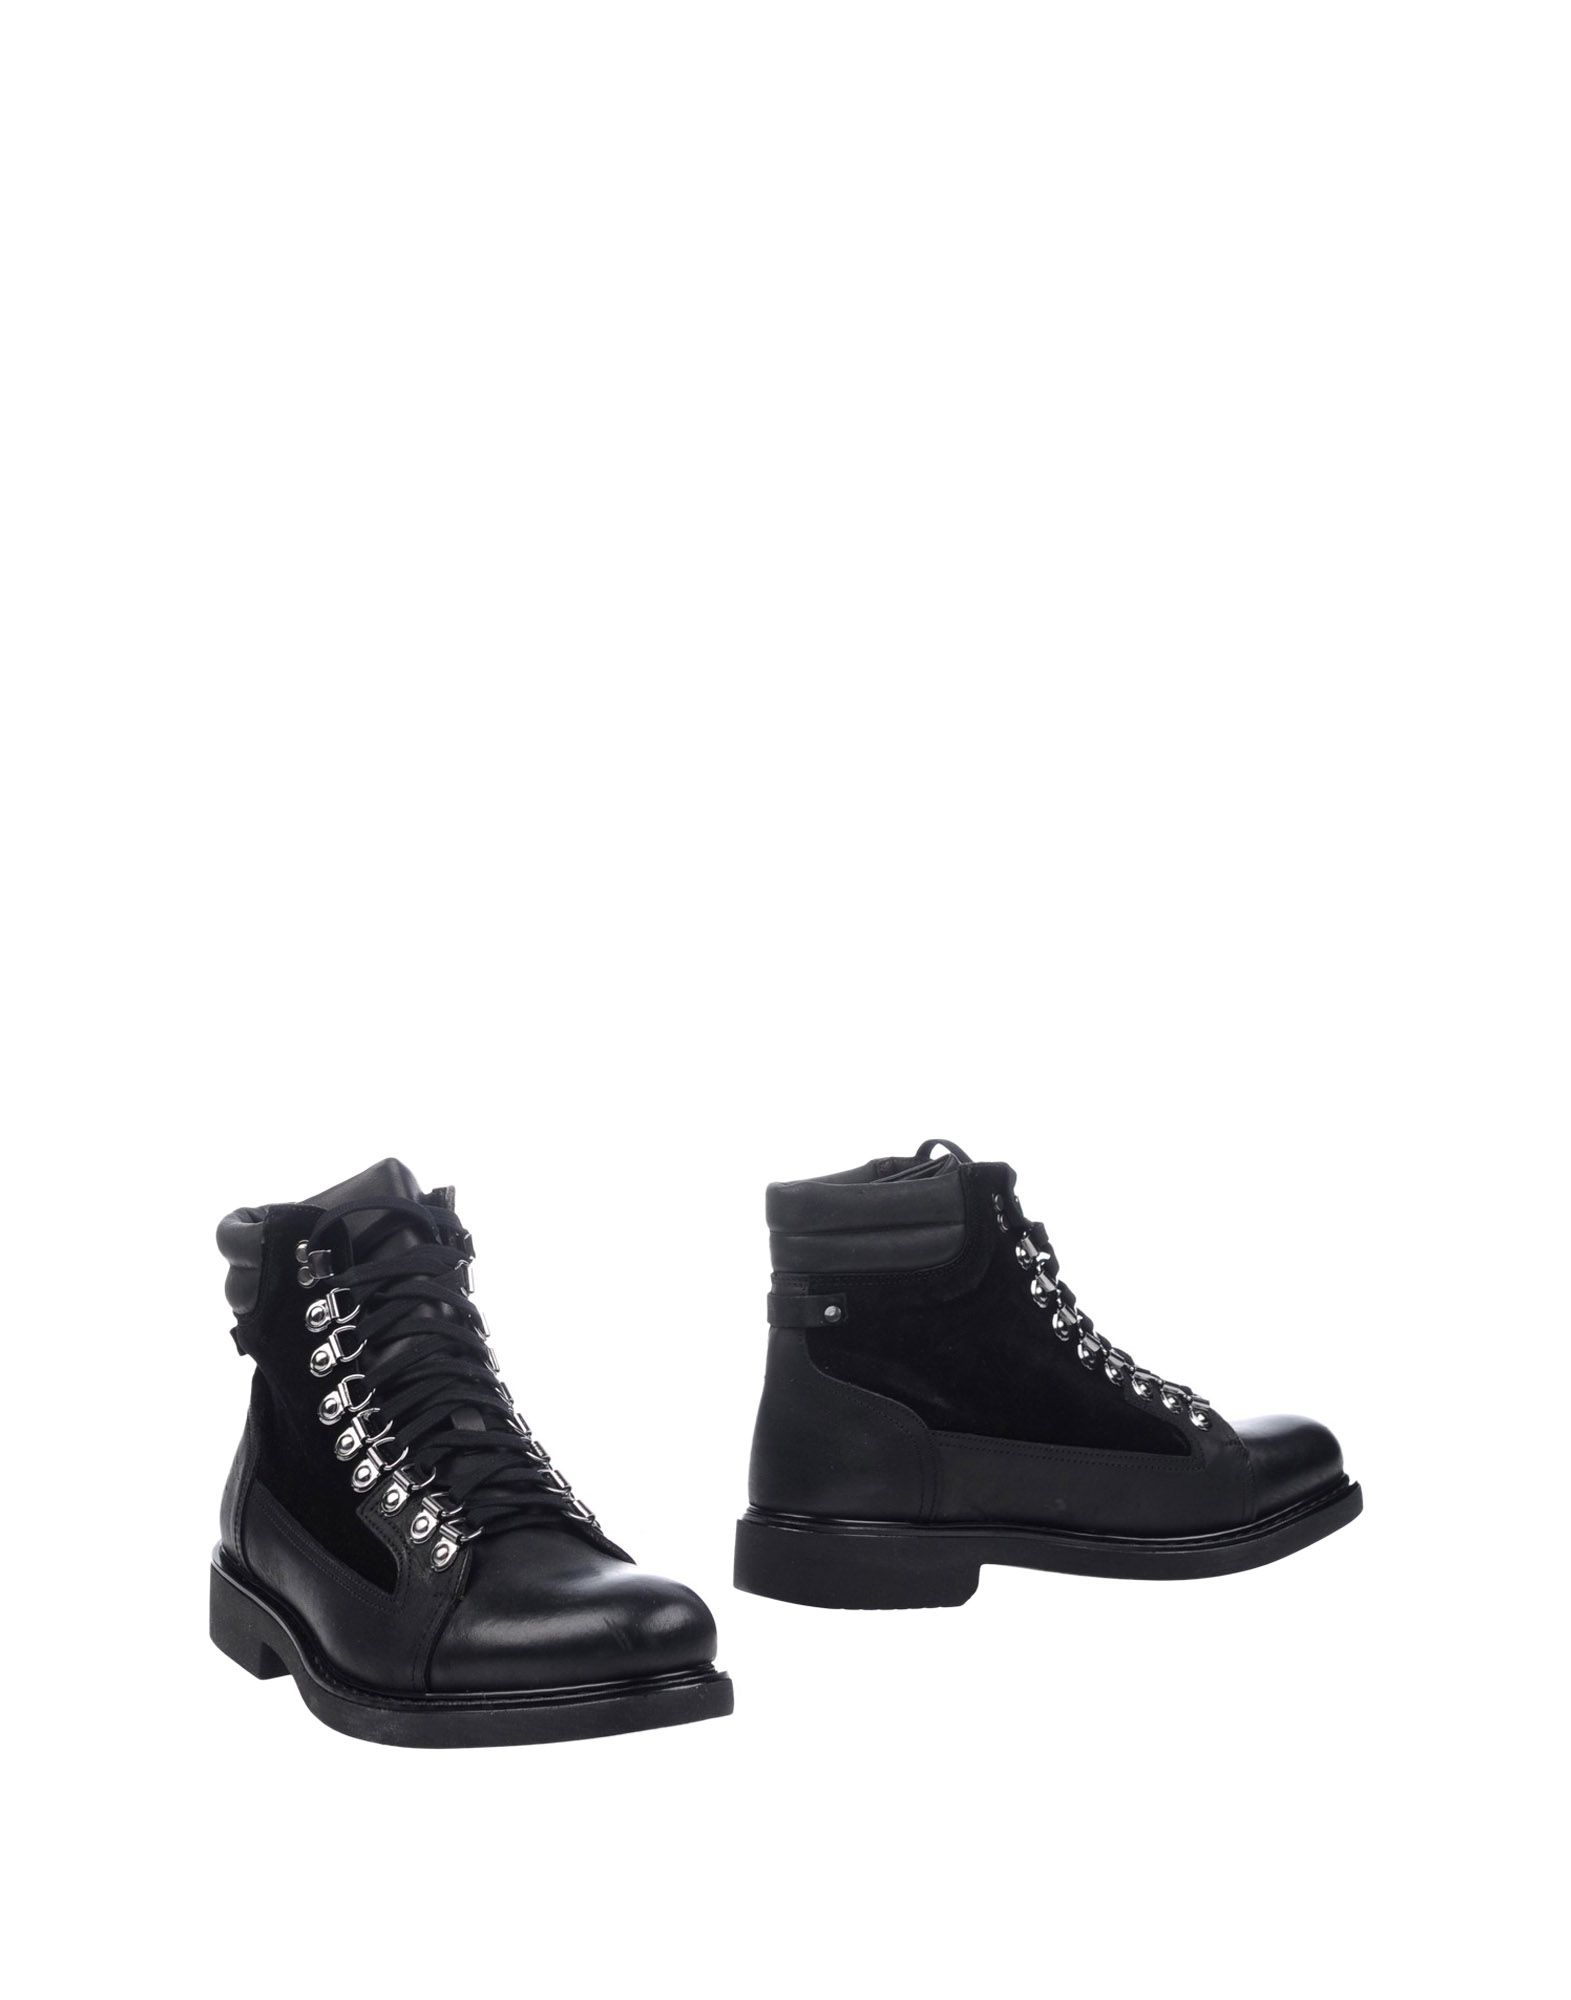 Rabatt echte Schuhe Daniele Alessandrini Stiefelette Herren  11288389ST